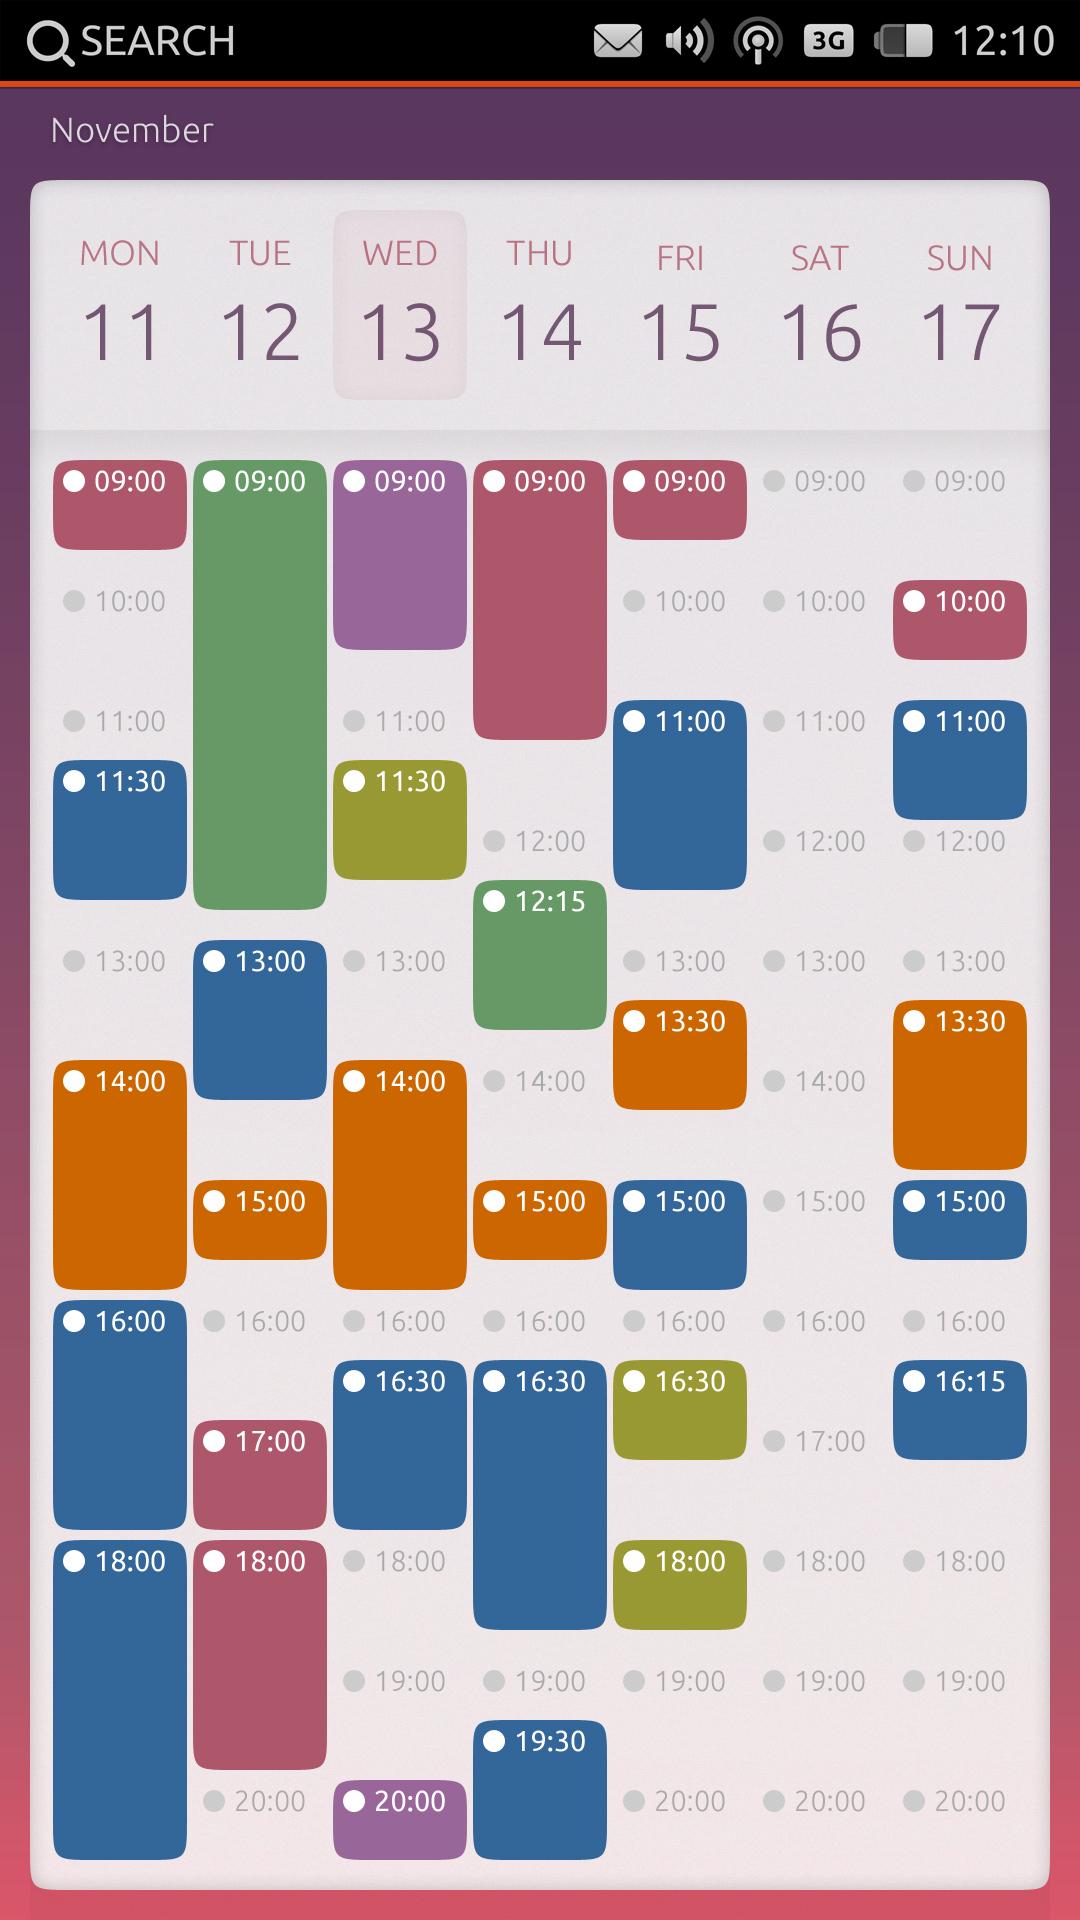 https://img.linux.net.cn/data/attachment/album/201308/18/1328244hzsq04hbtgjt8bt.jpg